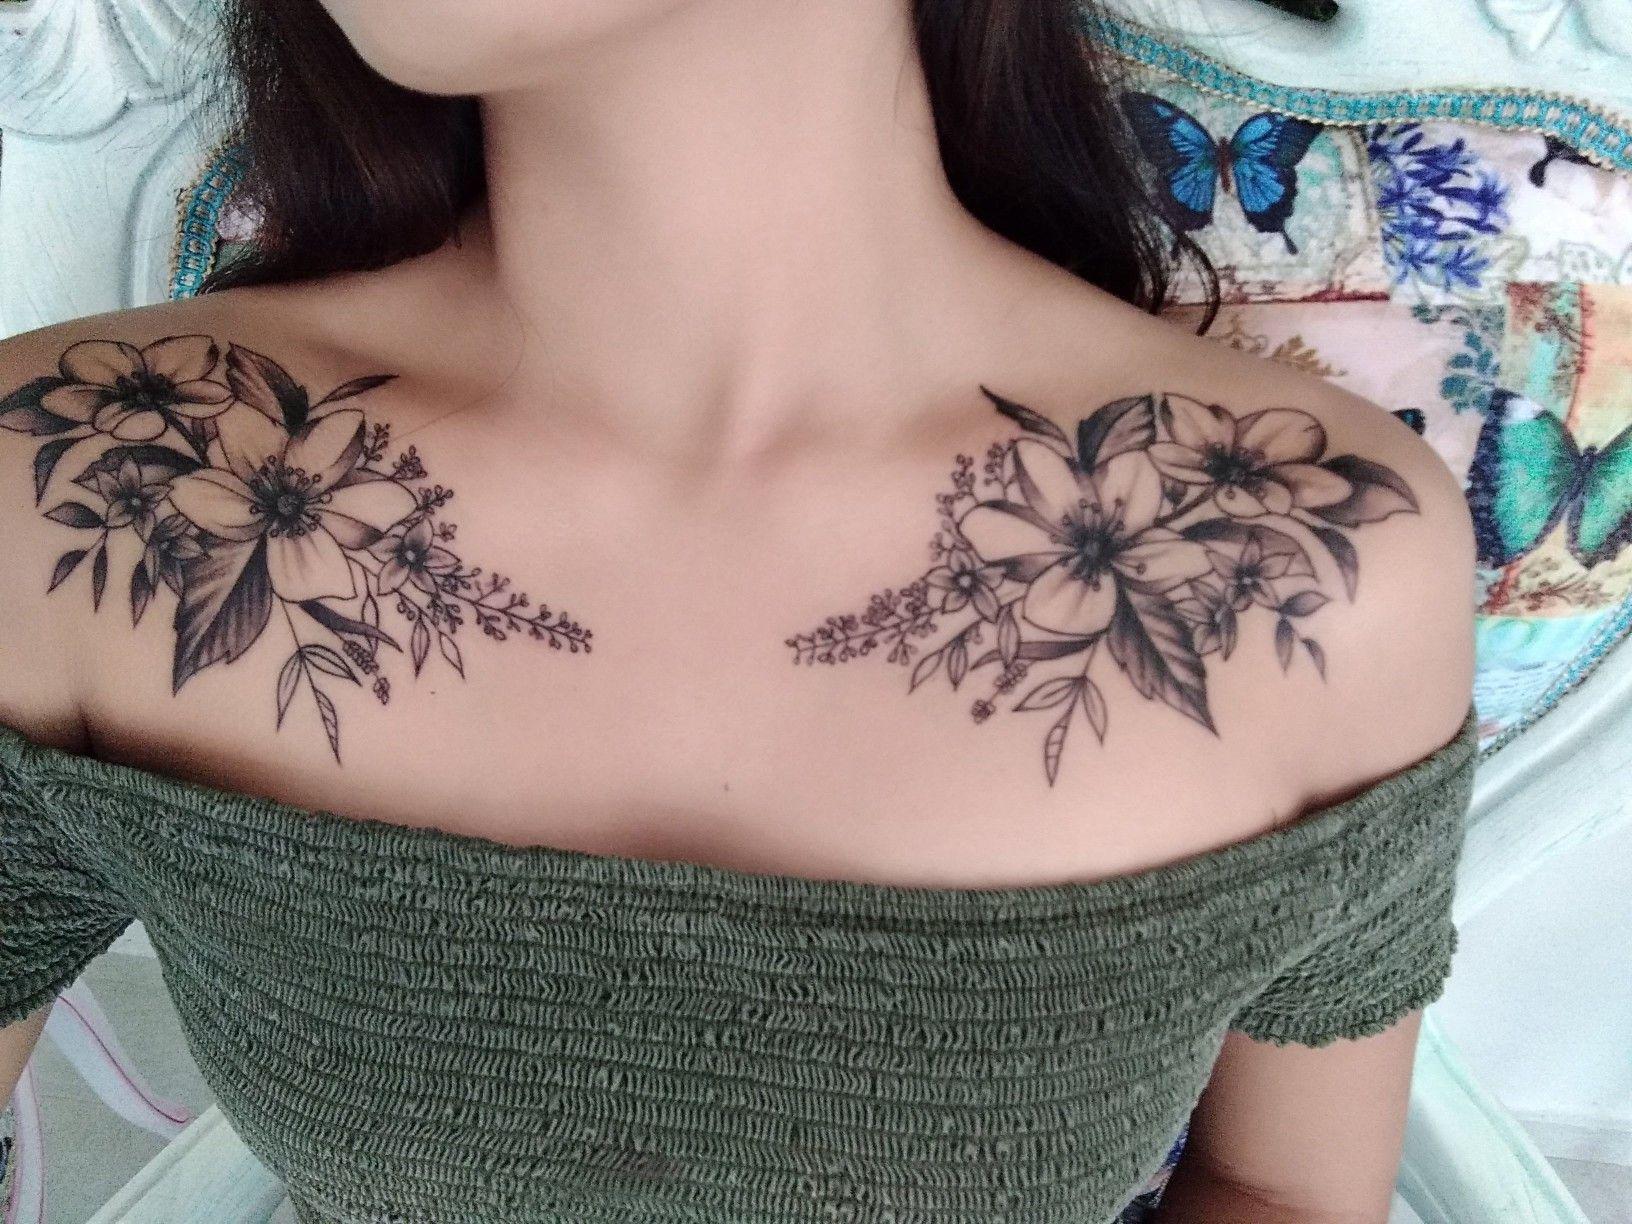 Pin By Hailey Lariscy On New Tattoo Tattoos Collar Bone Tattoo Shoulder Tattoos For Women